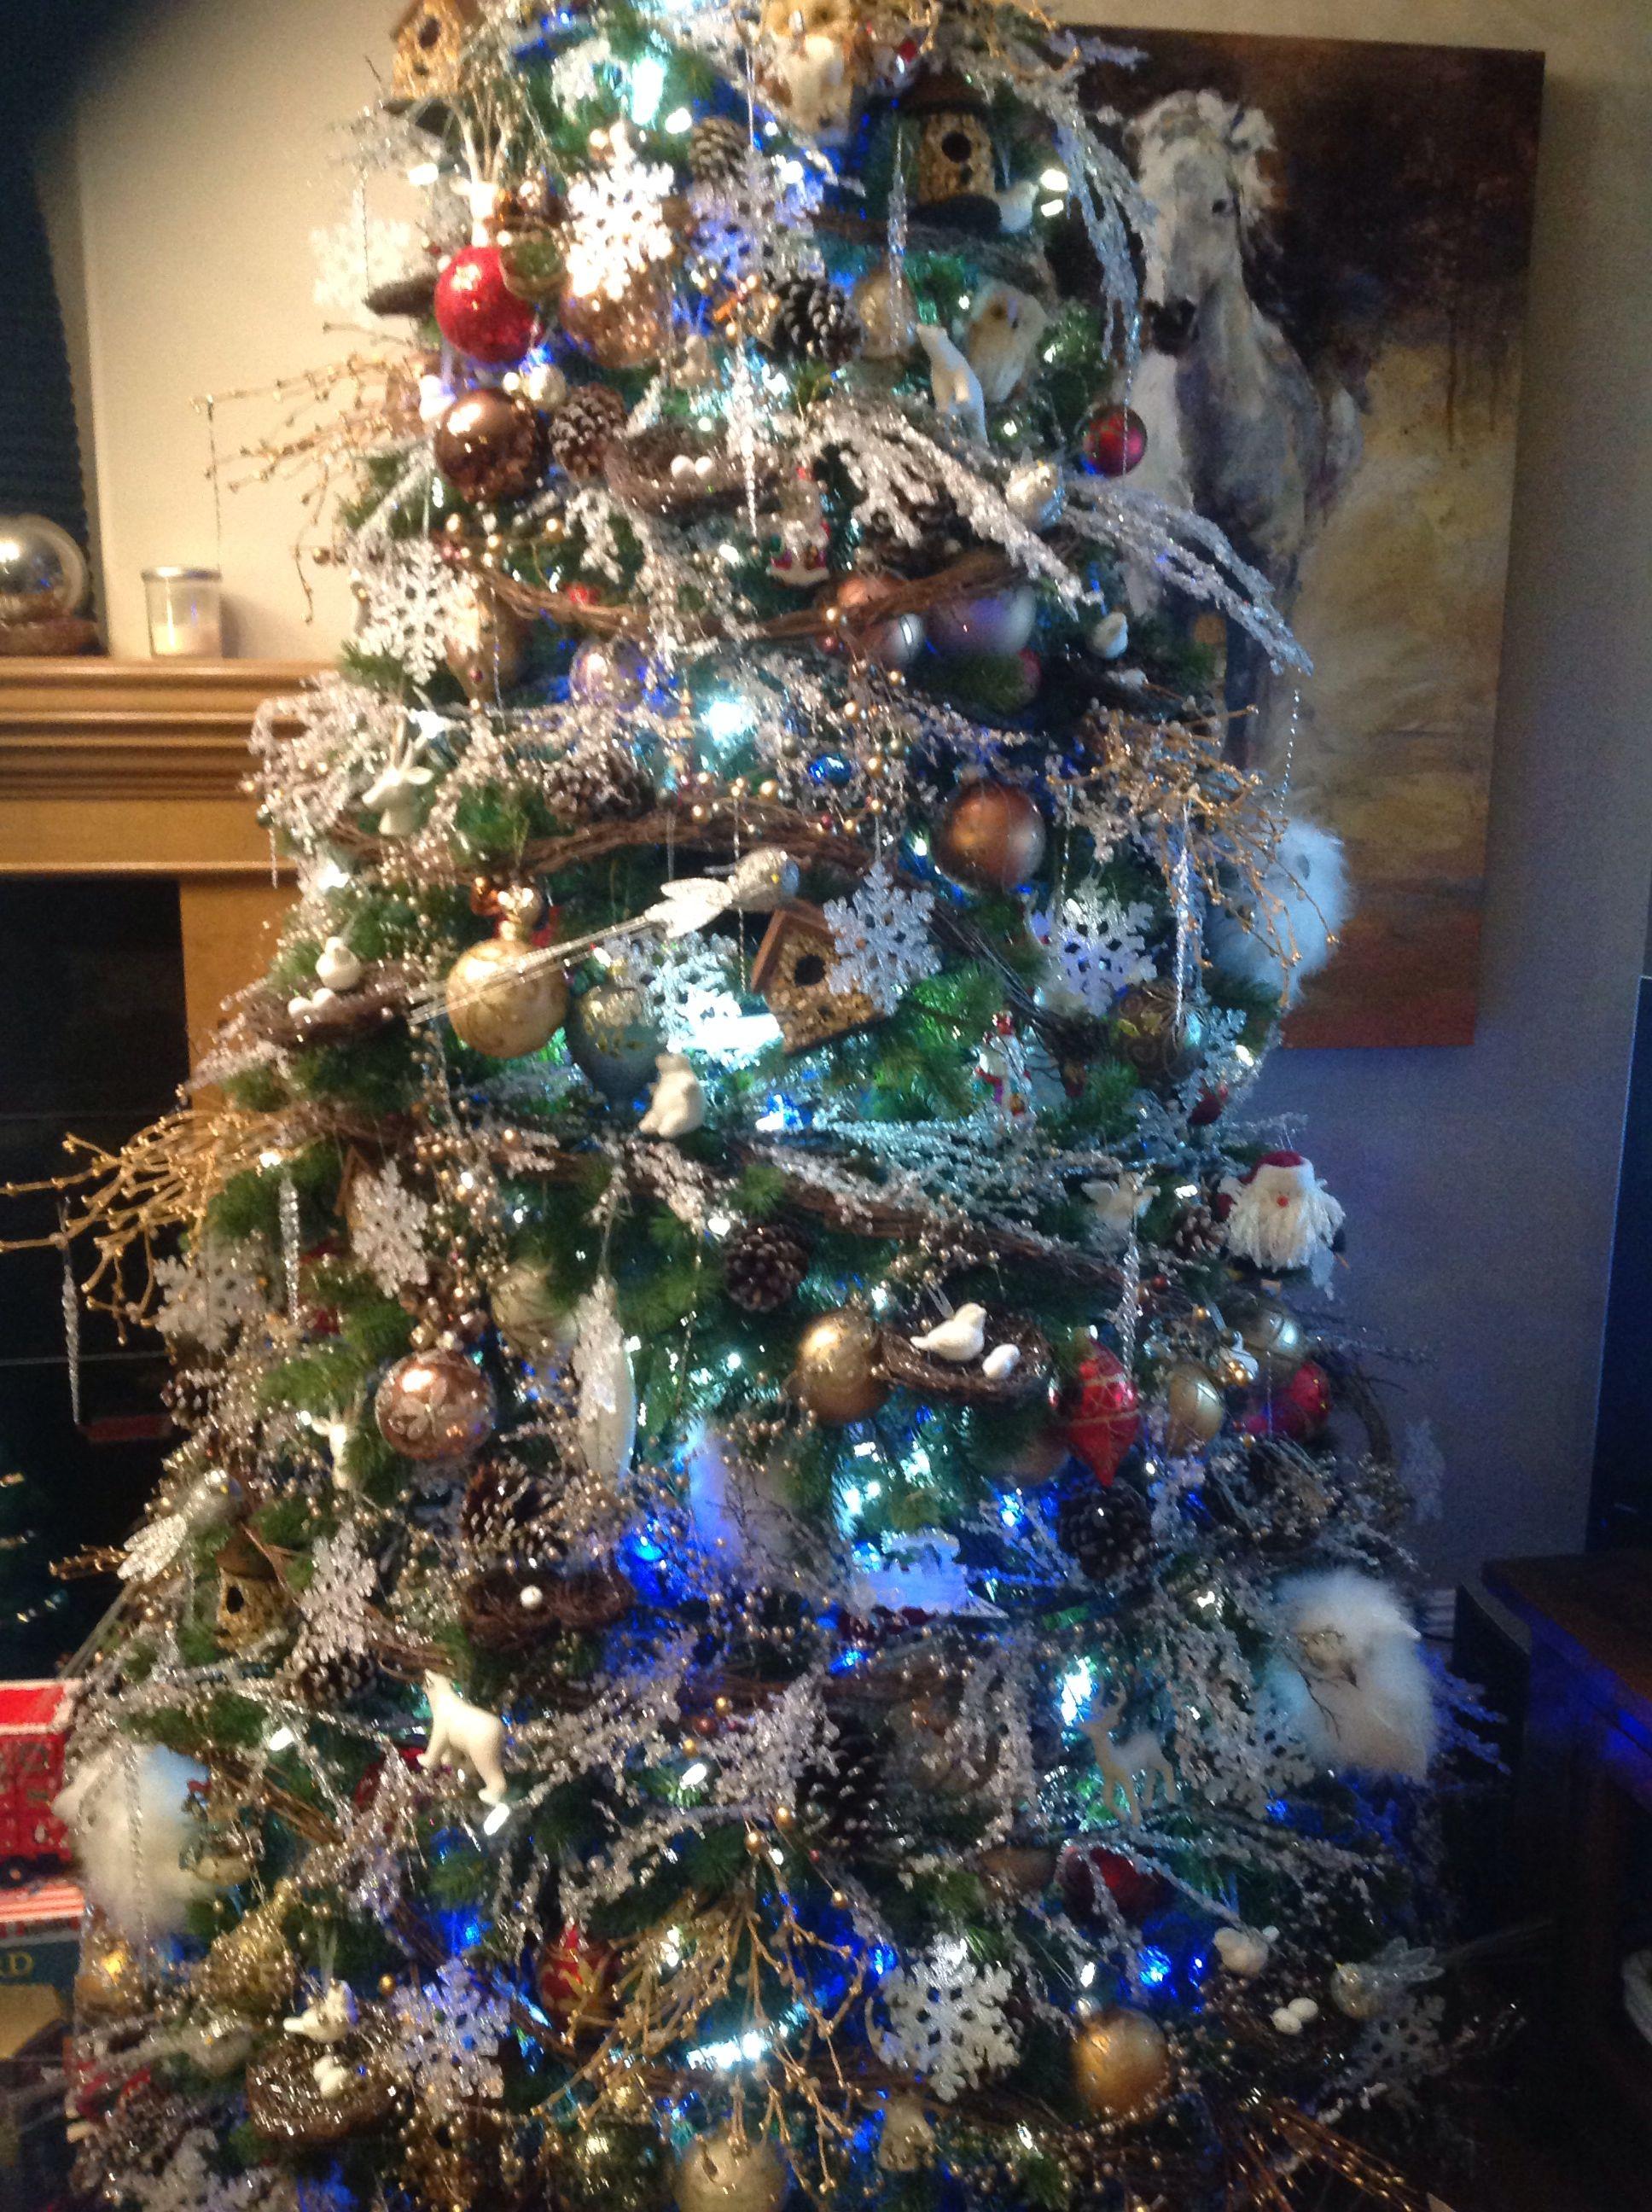 Christmas tree birds owls snow flakes Christmas trees